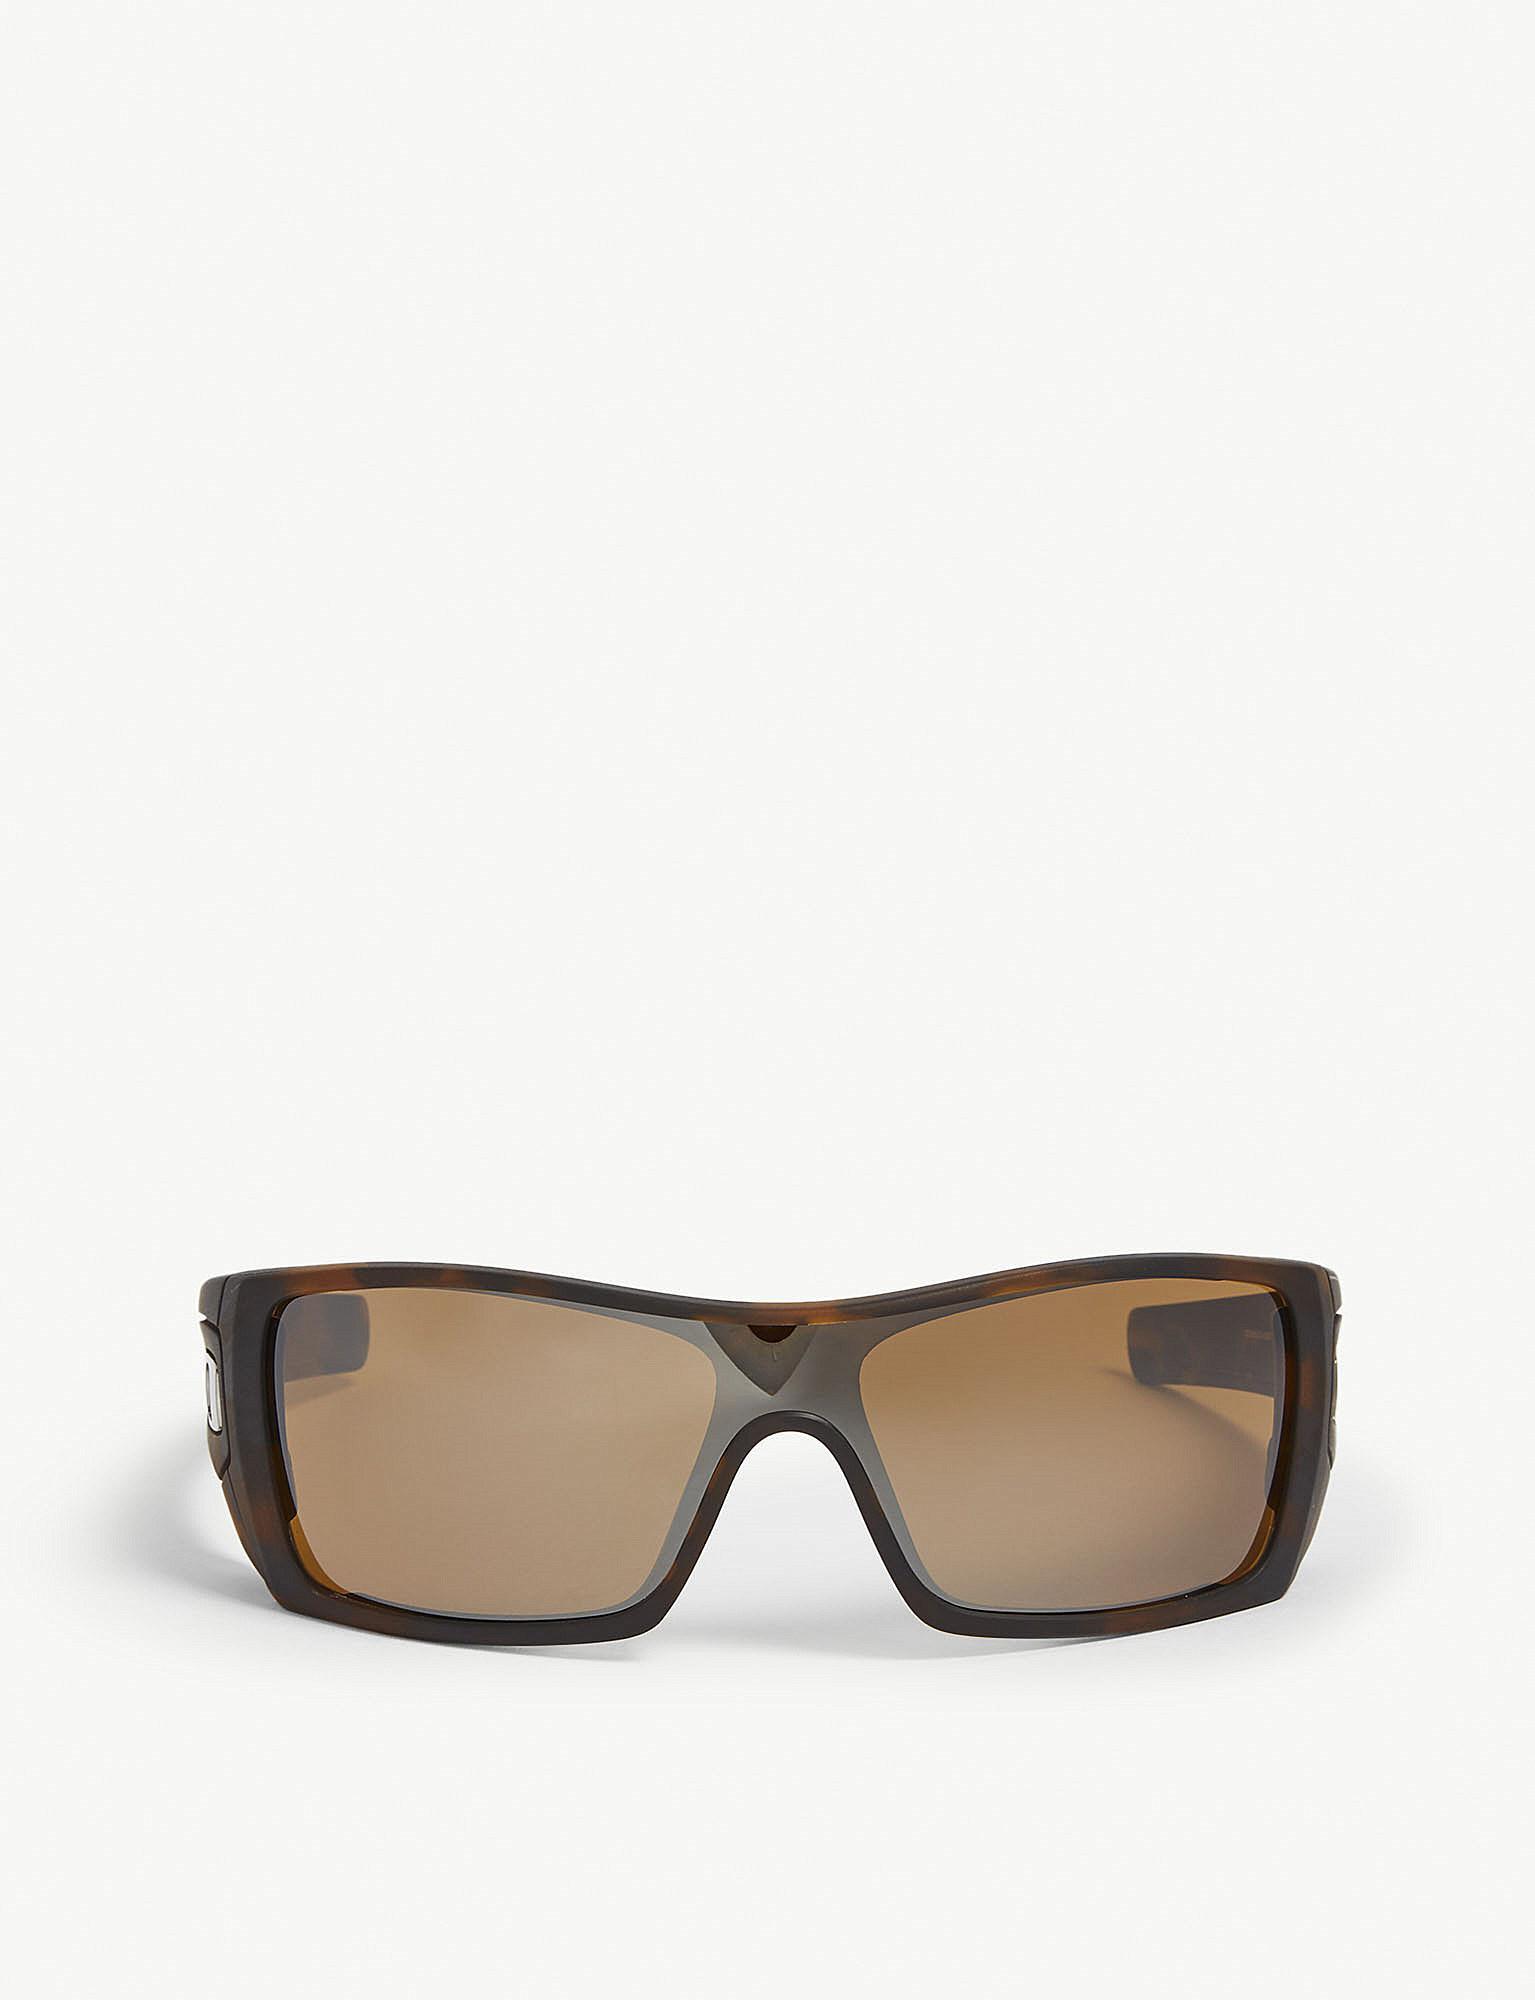 30d8daa8472 Oakley Batwolf Havana Rectangle-frame Sunglasses in Brown for Men - Lyst